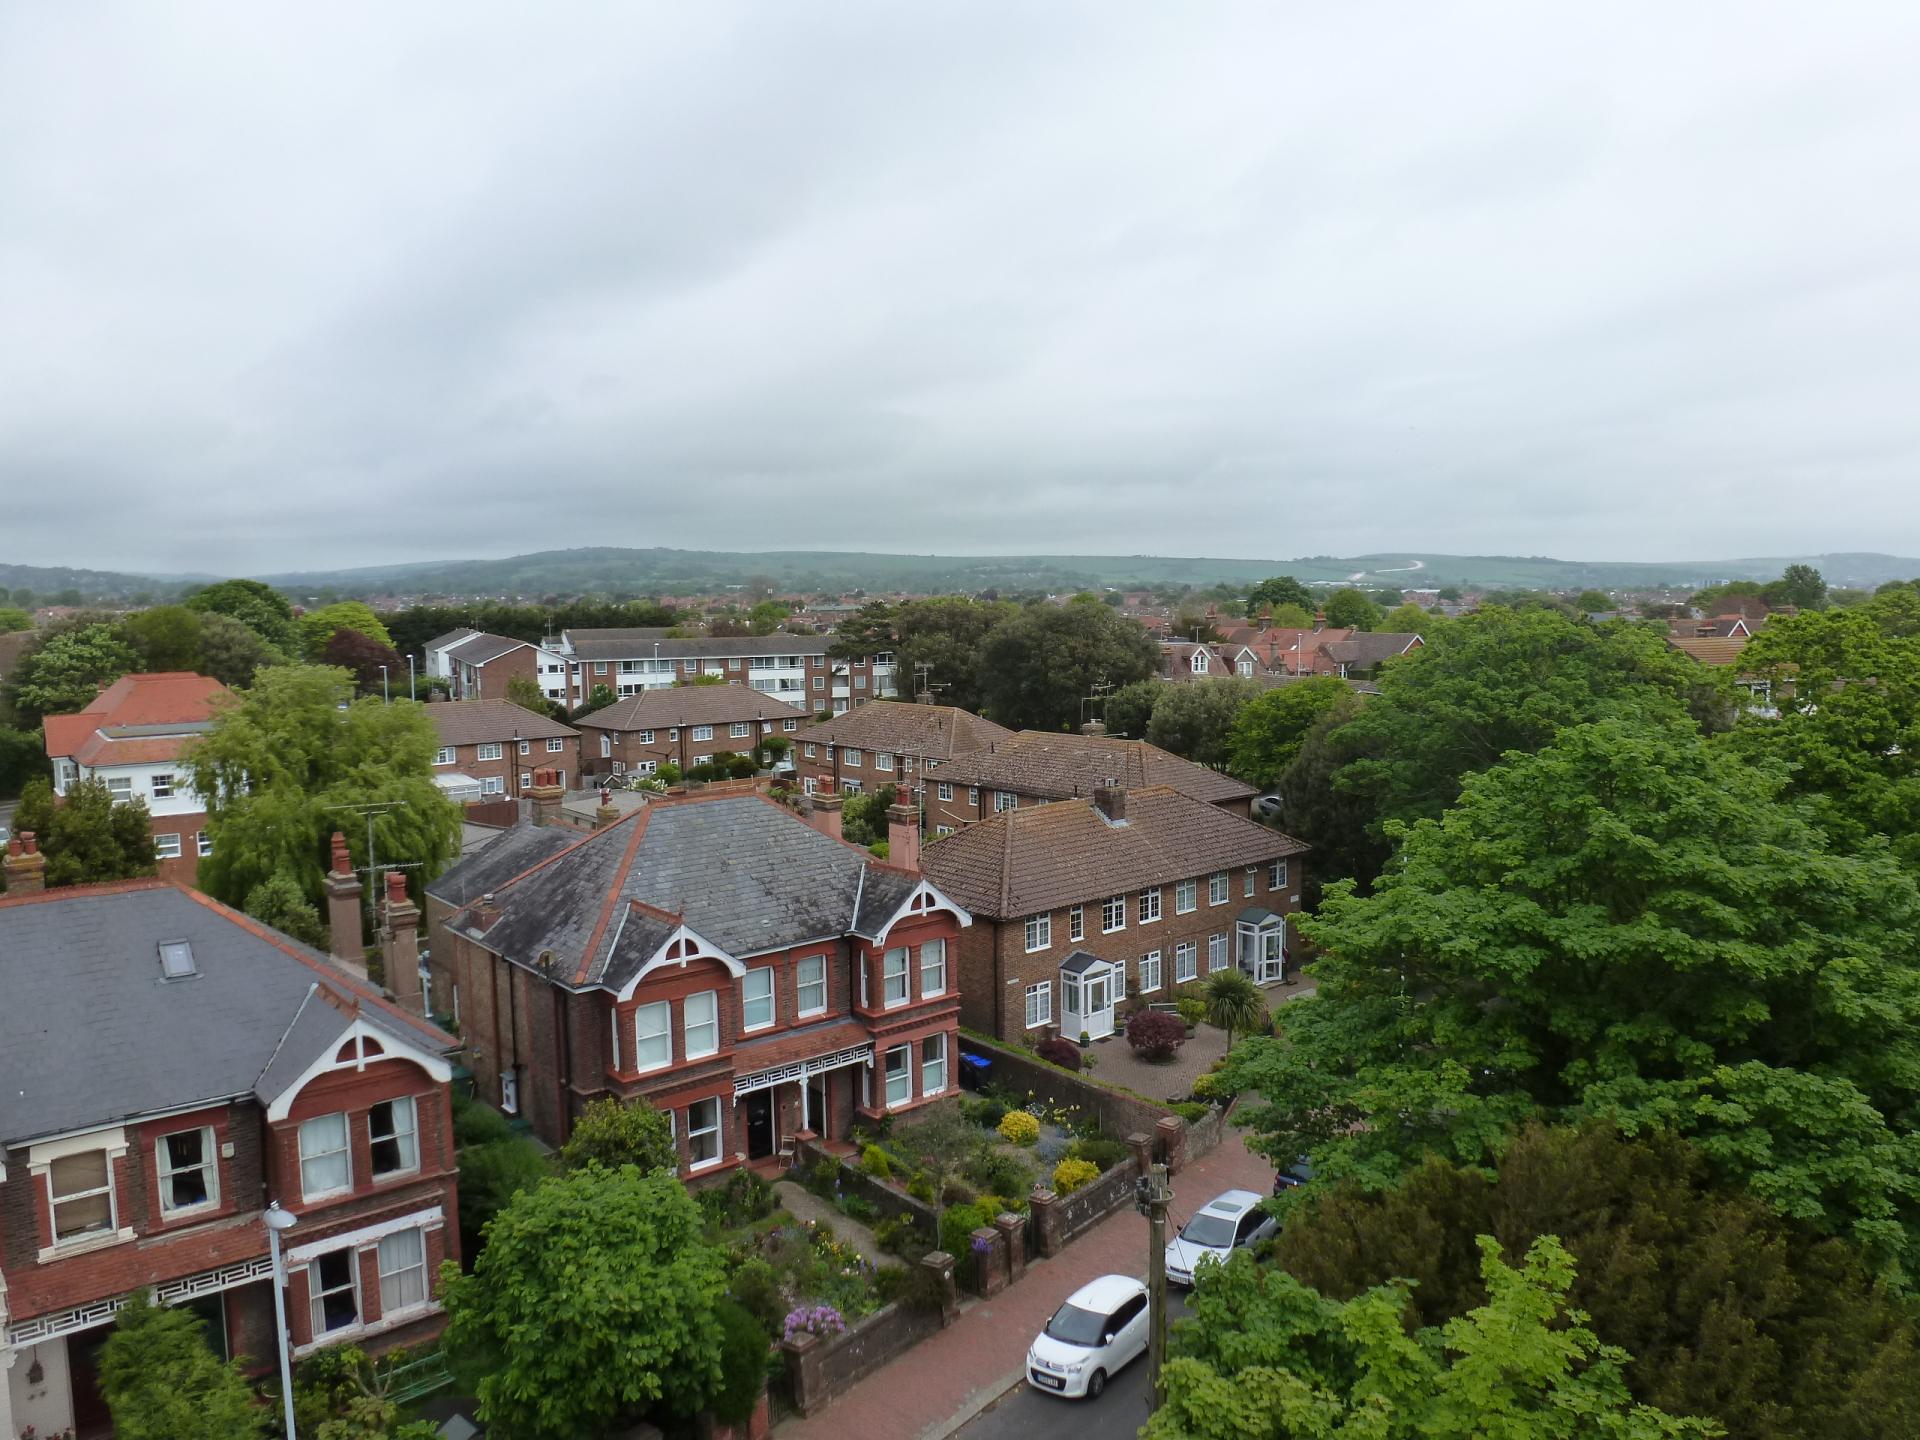 Heene view from St. Botolph's, Heene, 21.5.16